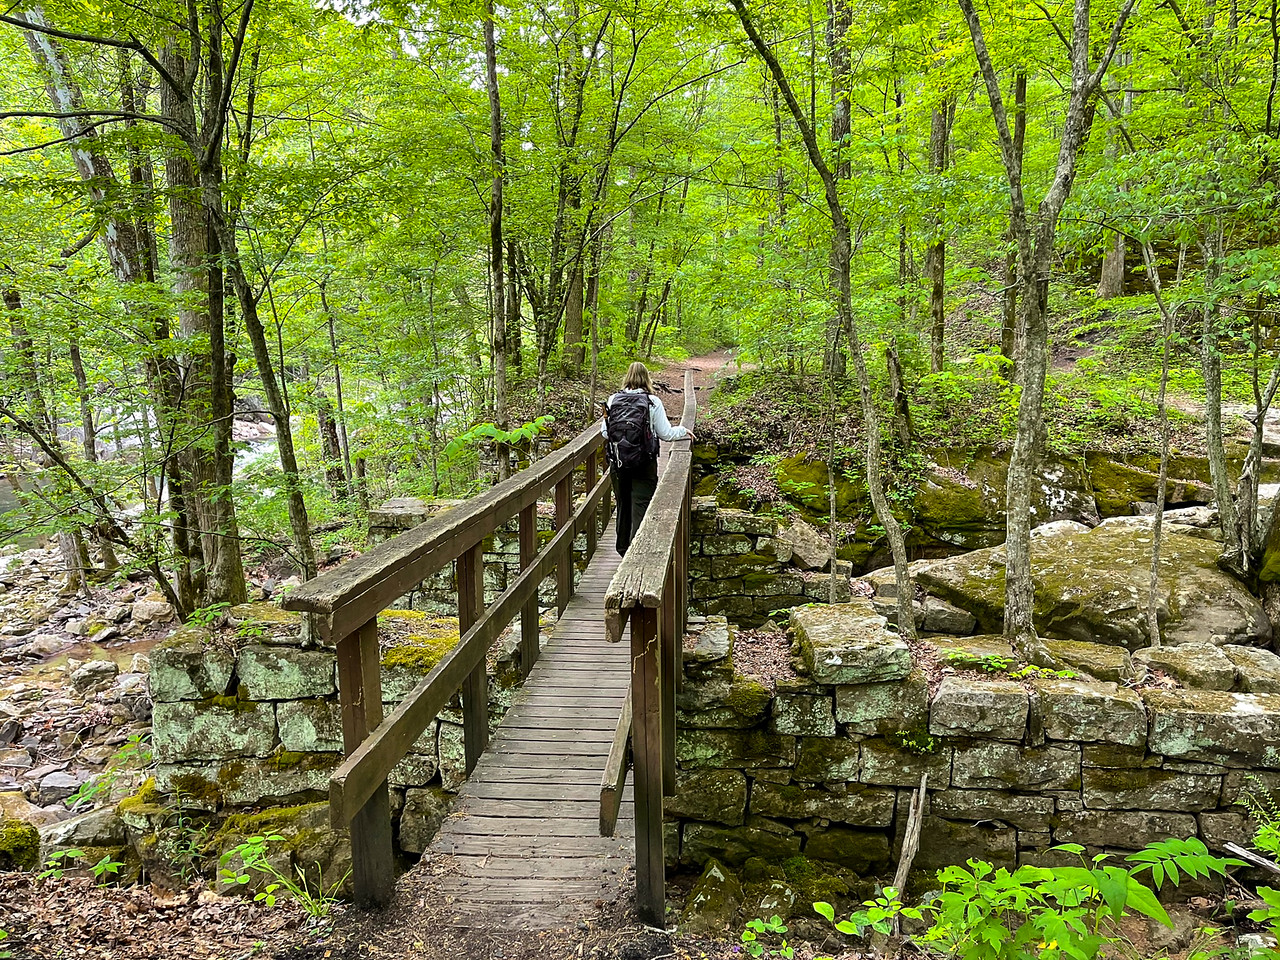 A wooden bridge crossing a small stream.